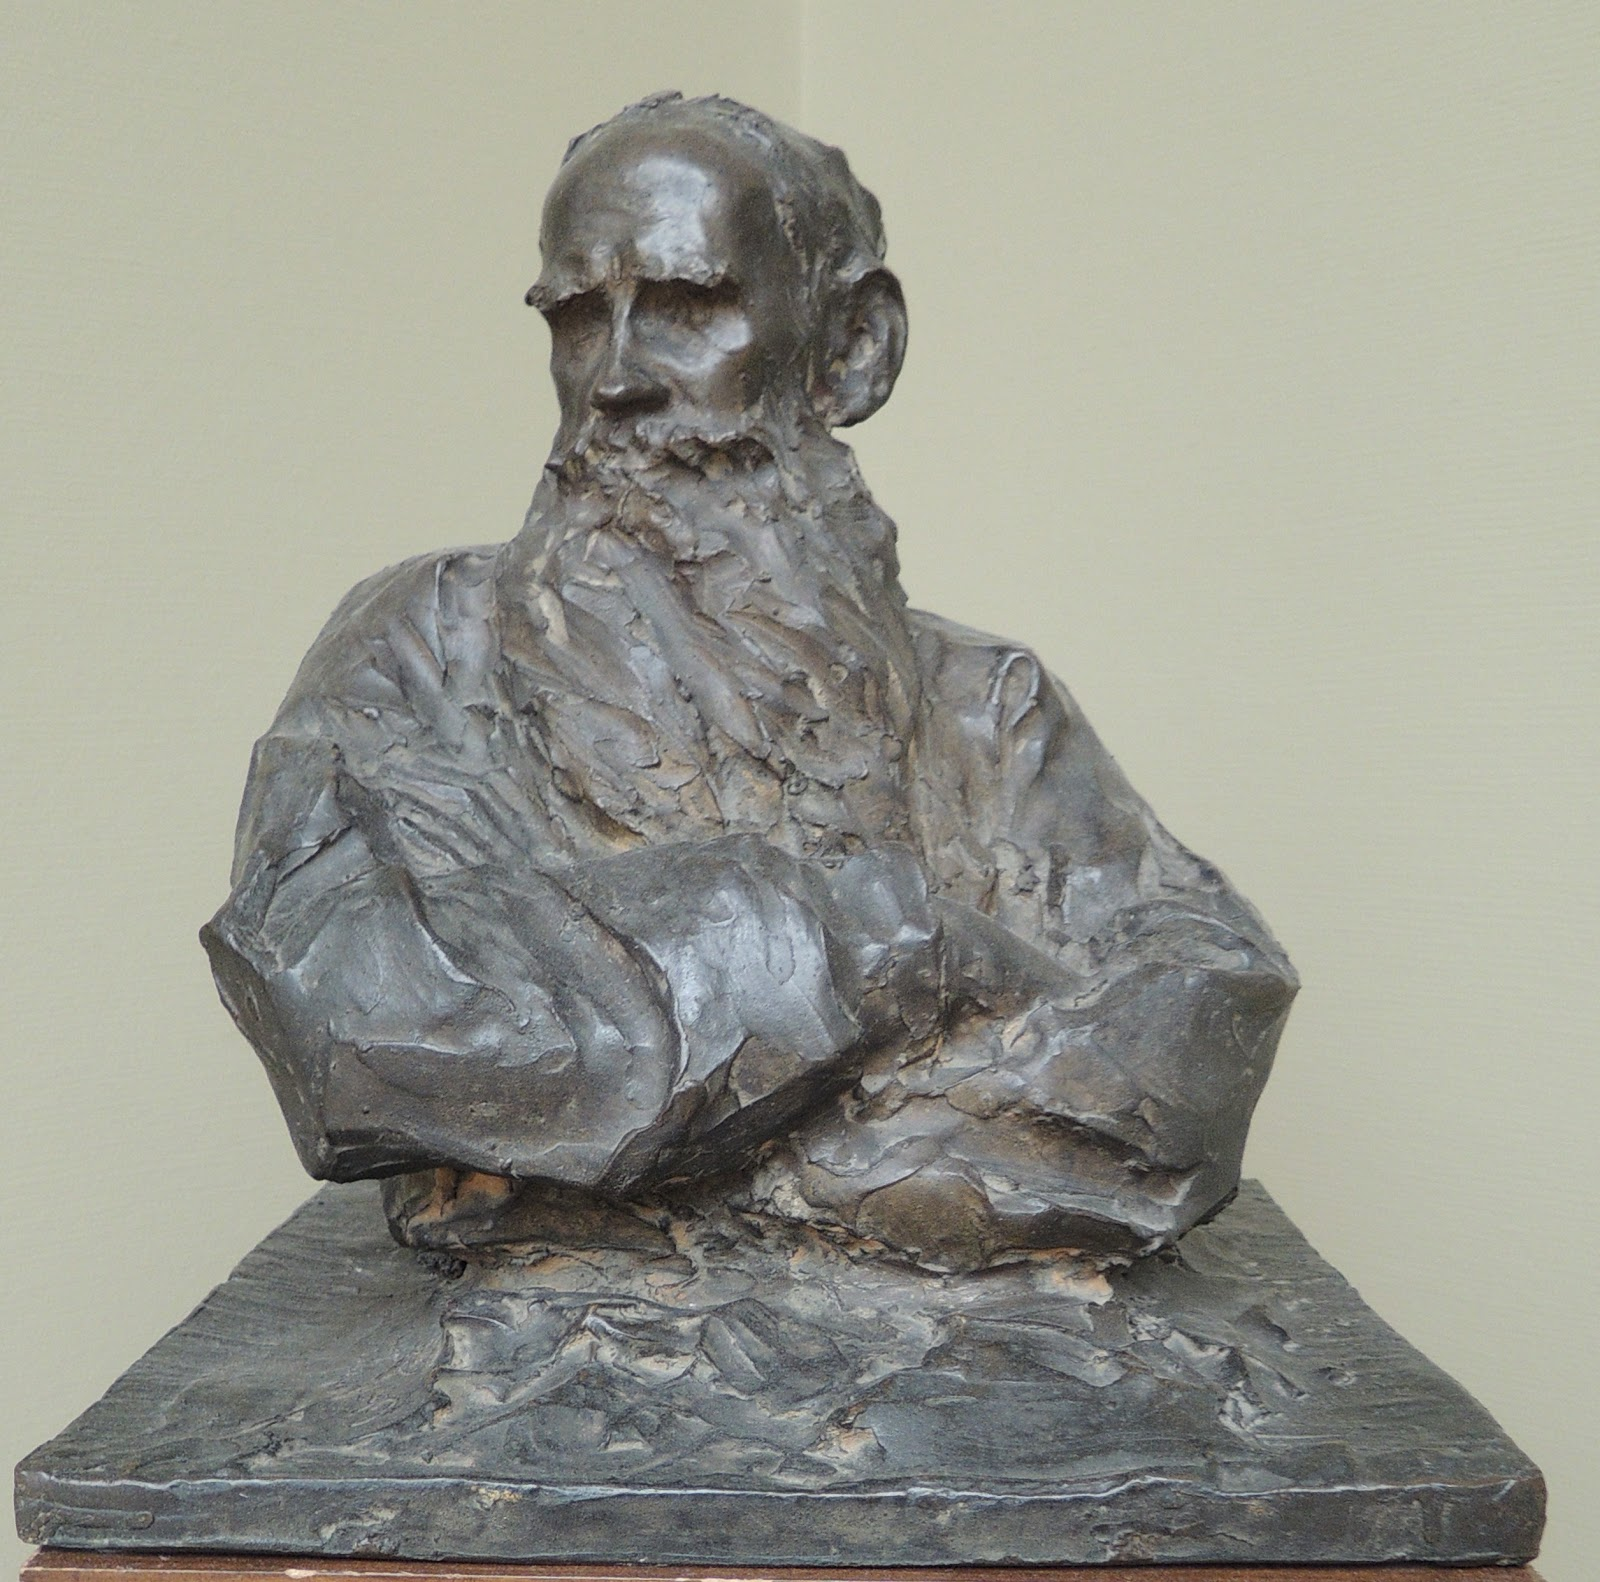 Paolo Troubetzkoy Lev Tolstoy